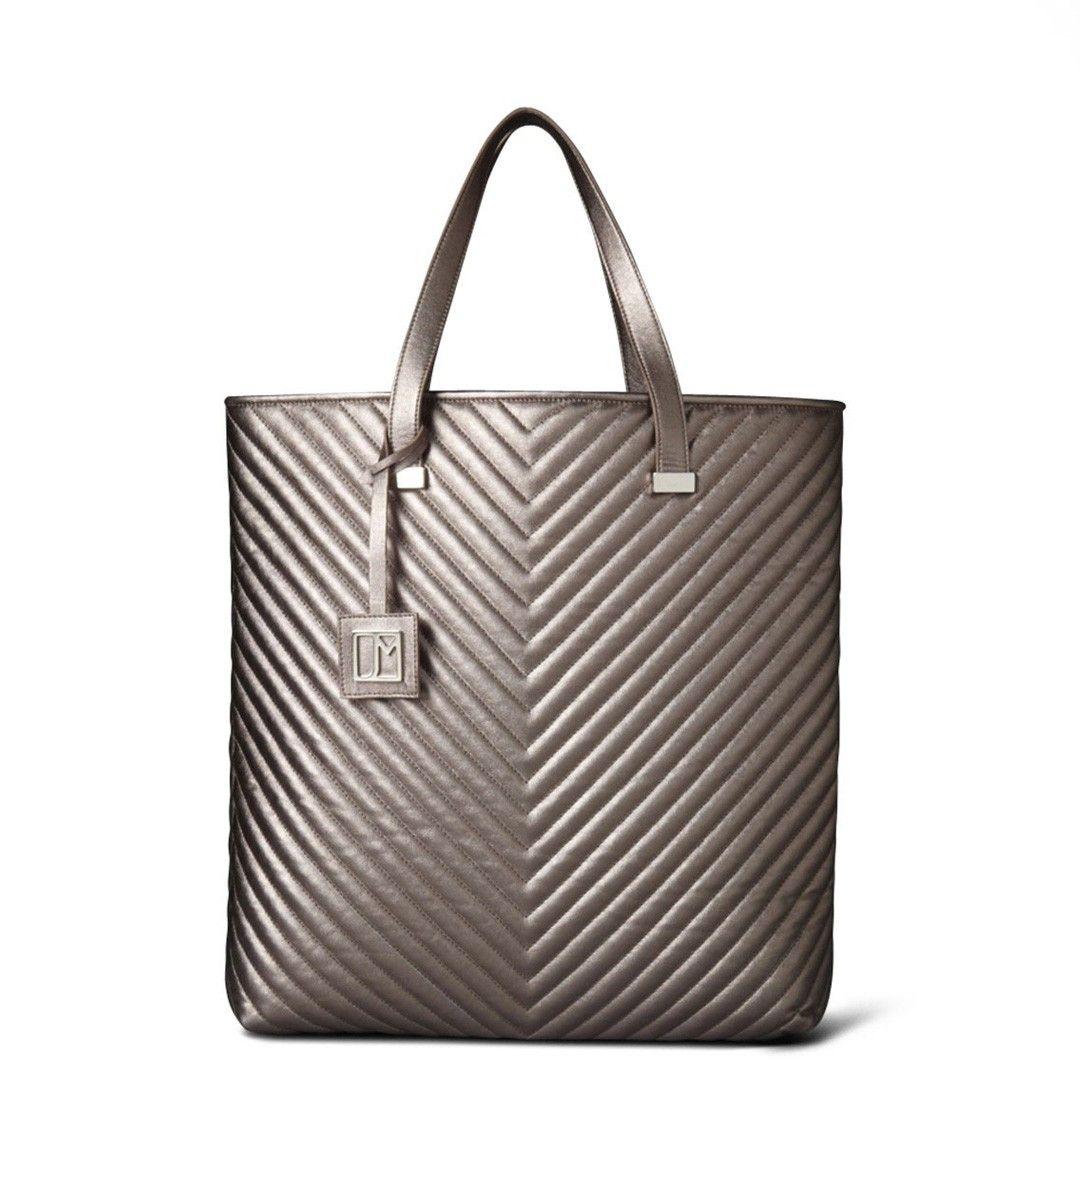 Jill Milan - Vegan Fashion | Made In Italy | Newport Quilted Tote Bronze Metallic 02712BRZ0